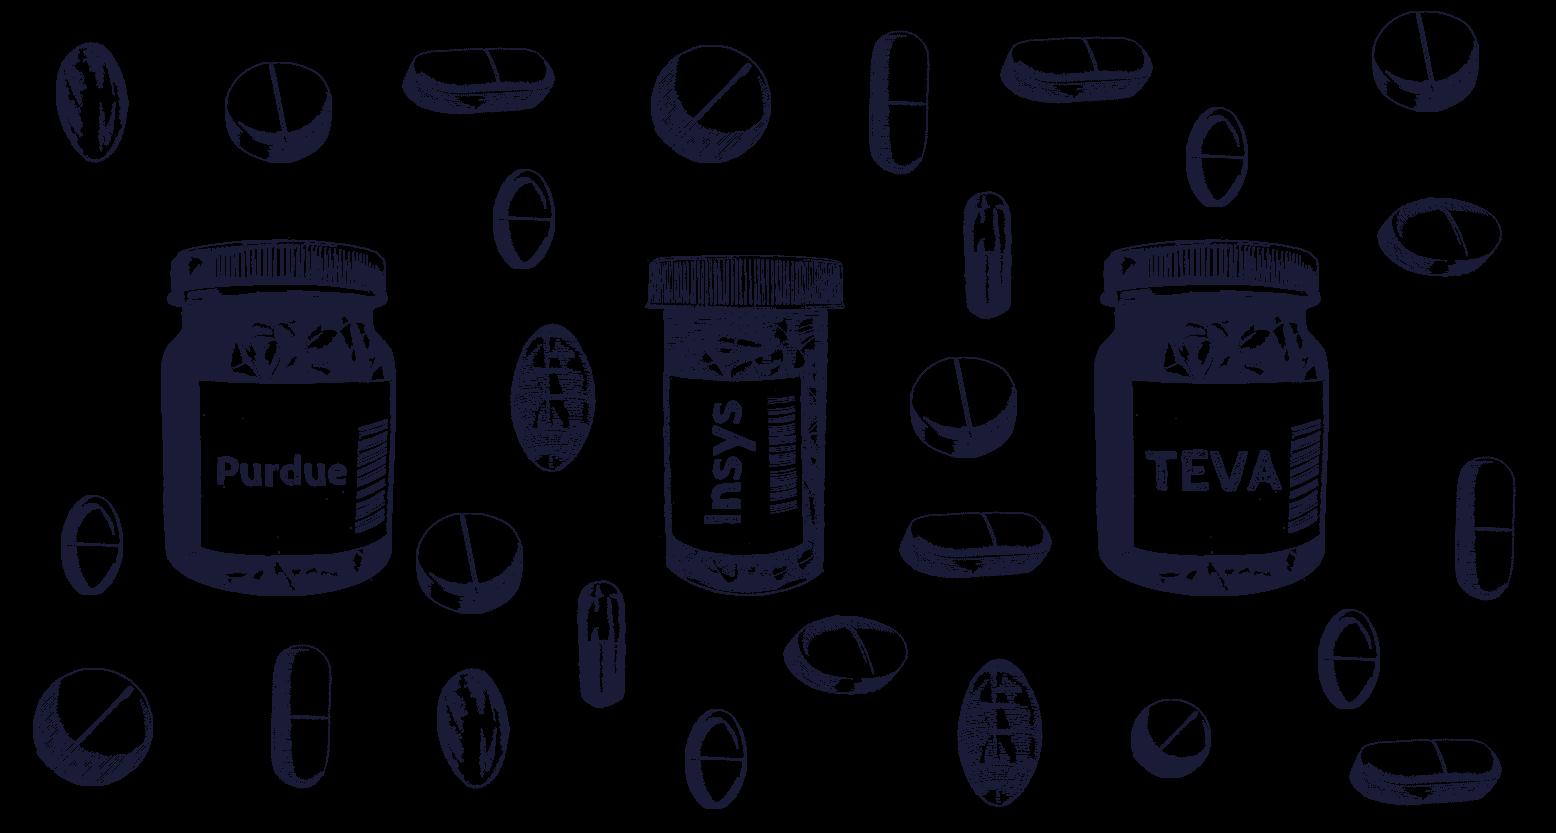 Company pill bottle